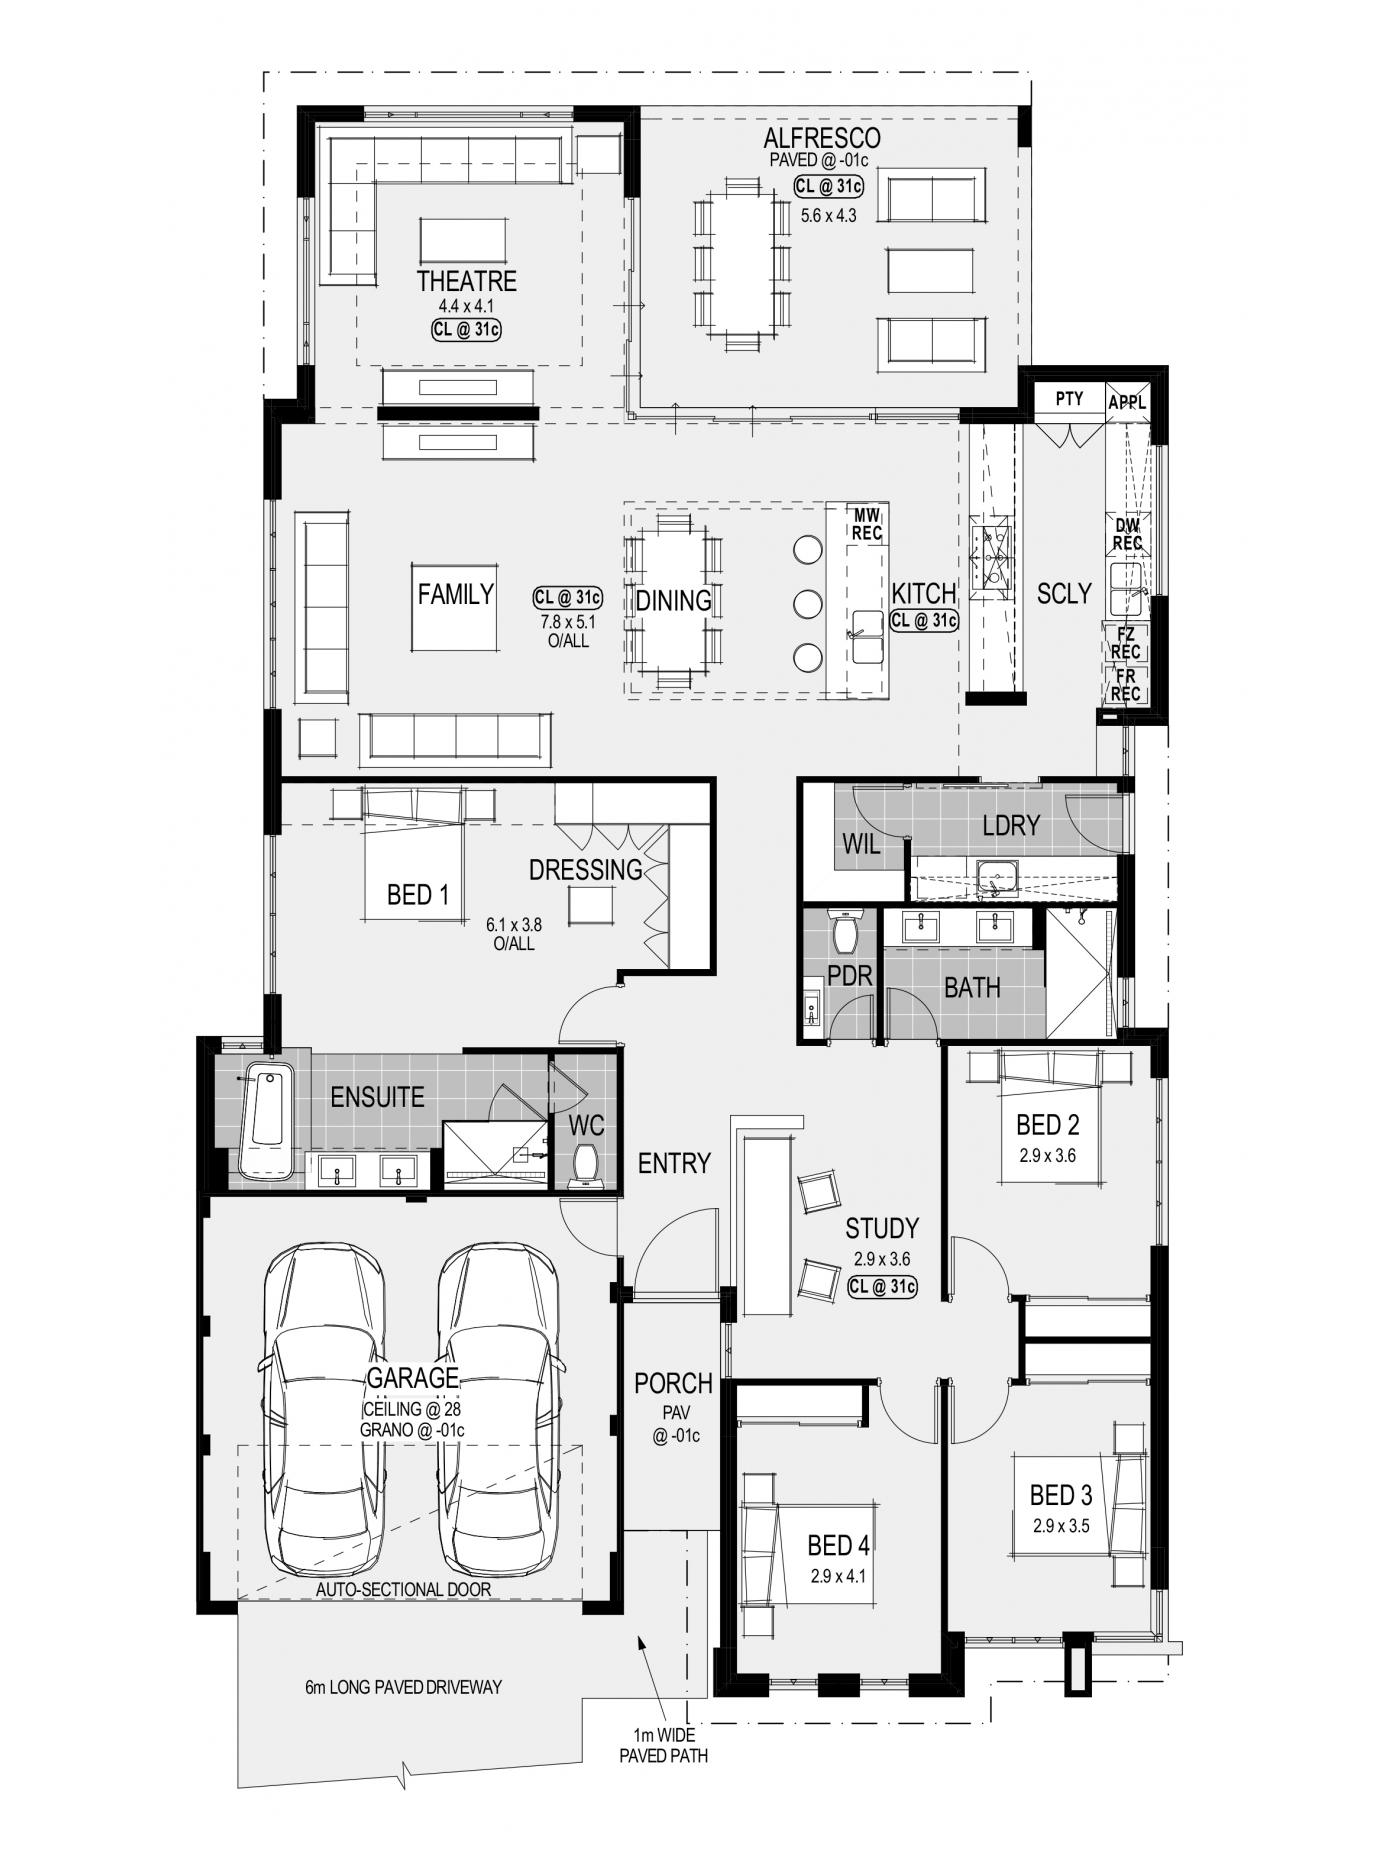 The Oakland Platinum Display Home By Home Group Wa Newhousing Com Au House Plans Australia Home Design Floor Plans House Plans